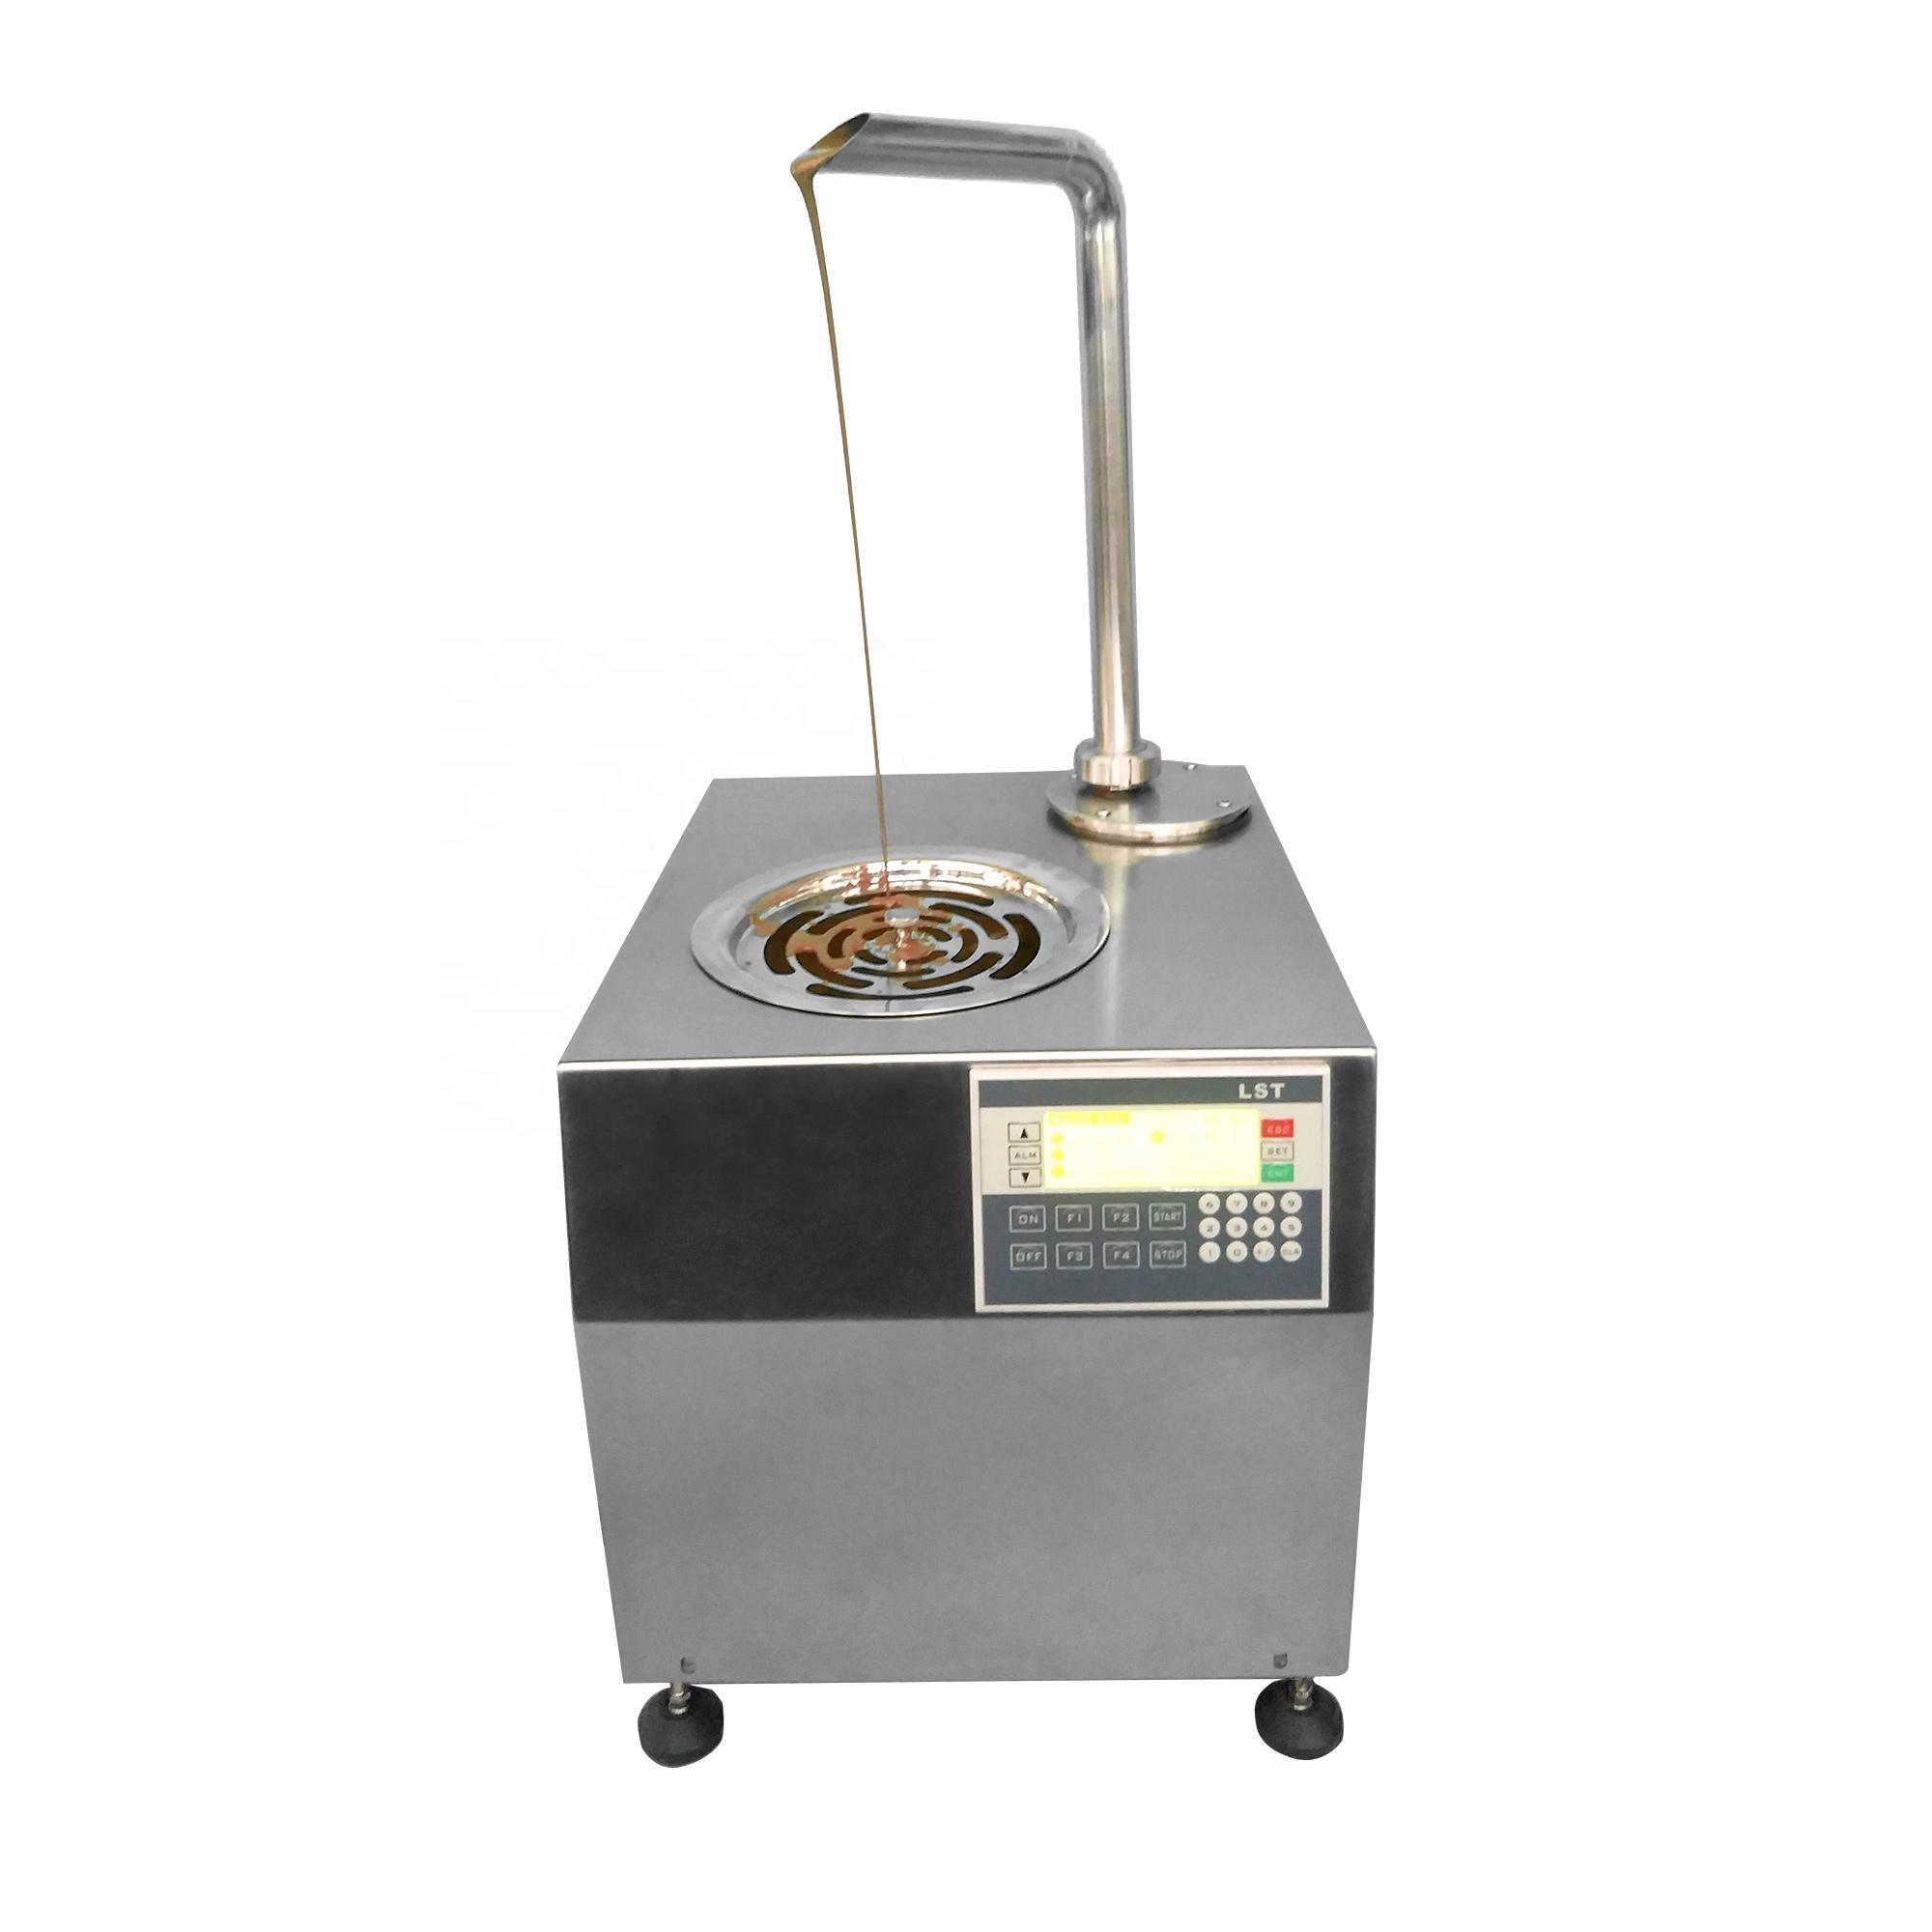 New Design 5.5 L Chocolate Tempering Machine Small Chocolate Tempering Machine Chocolate Dispensing Machine